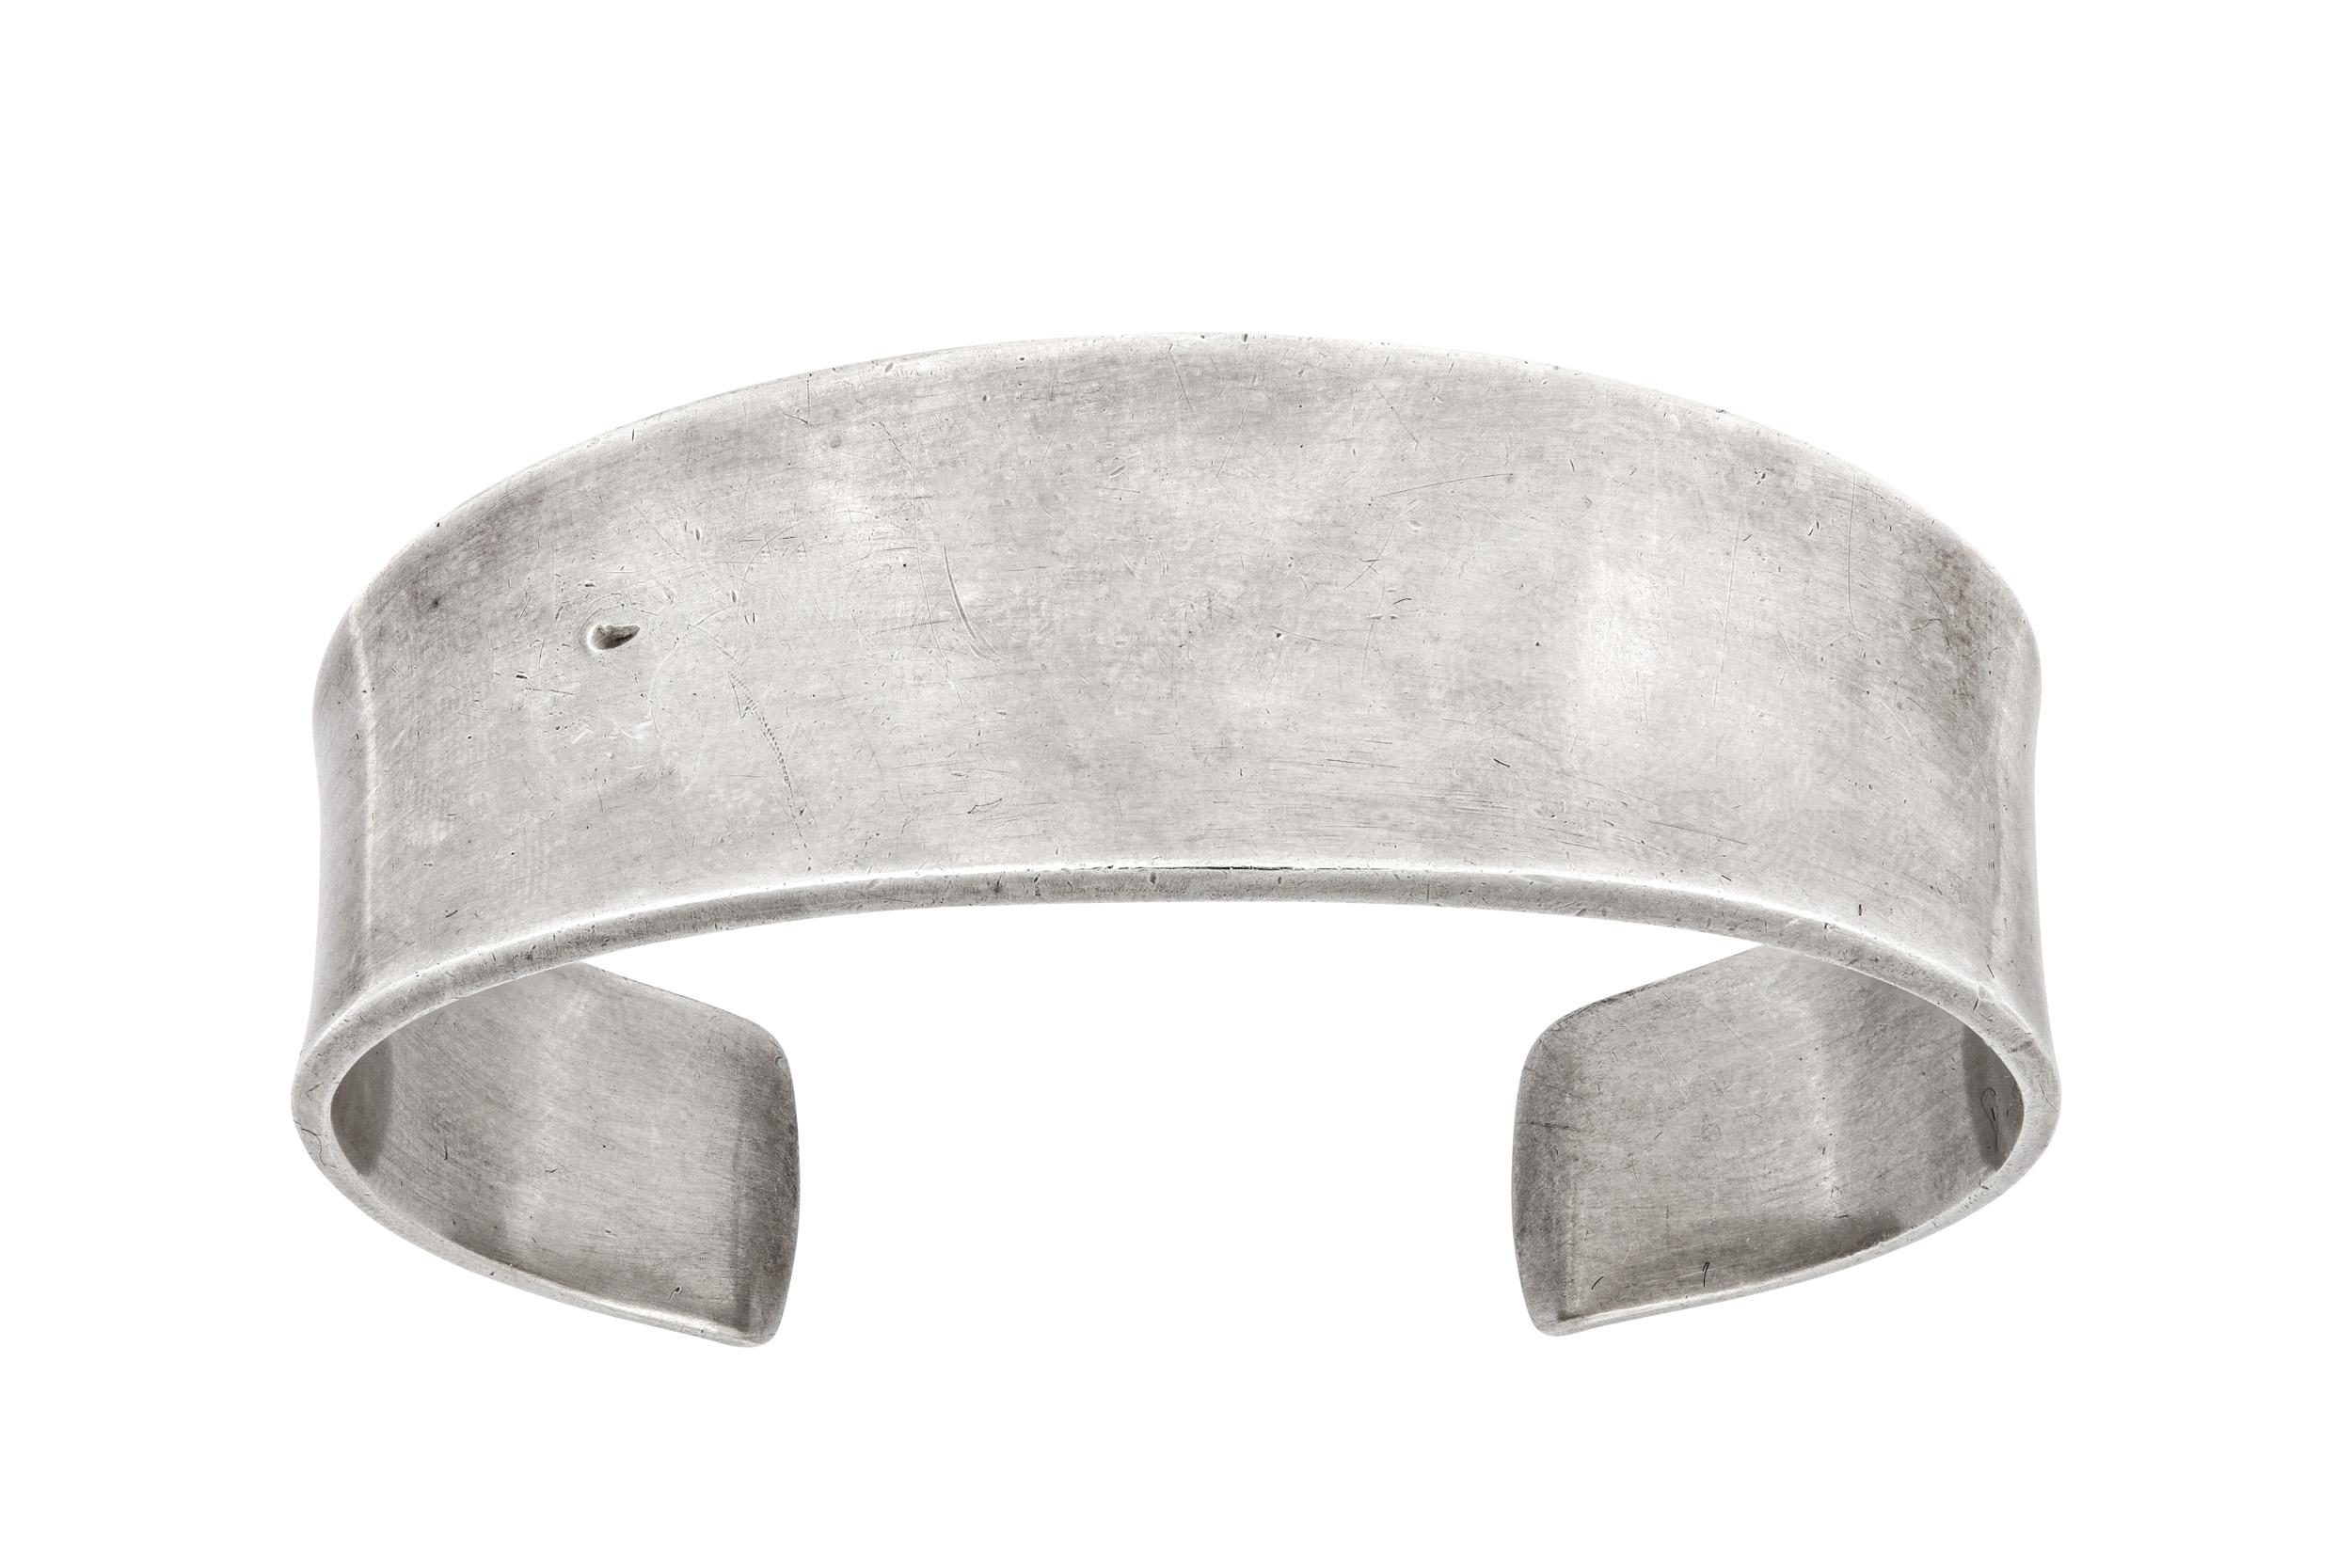 Lot 53 - A silver cuff, by Poul Hansen for Georg Jensen